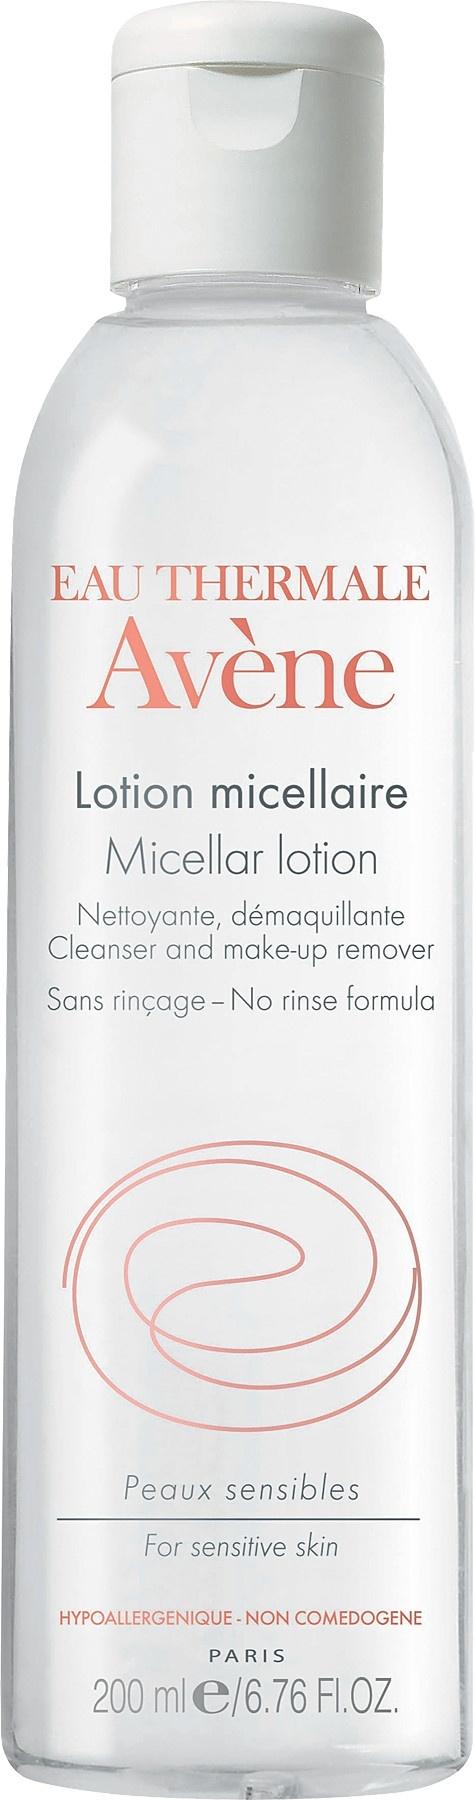 Avene Micellar Lotion Cleanser & Make-Up Remover 200ml